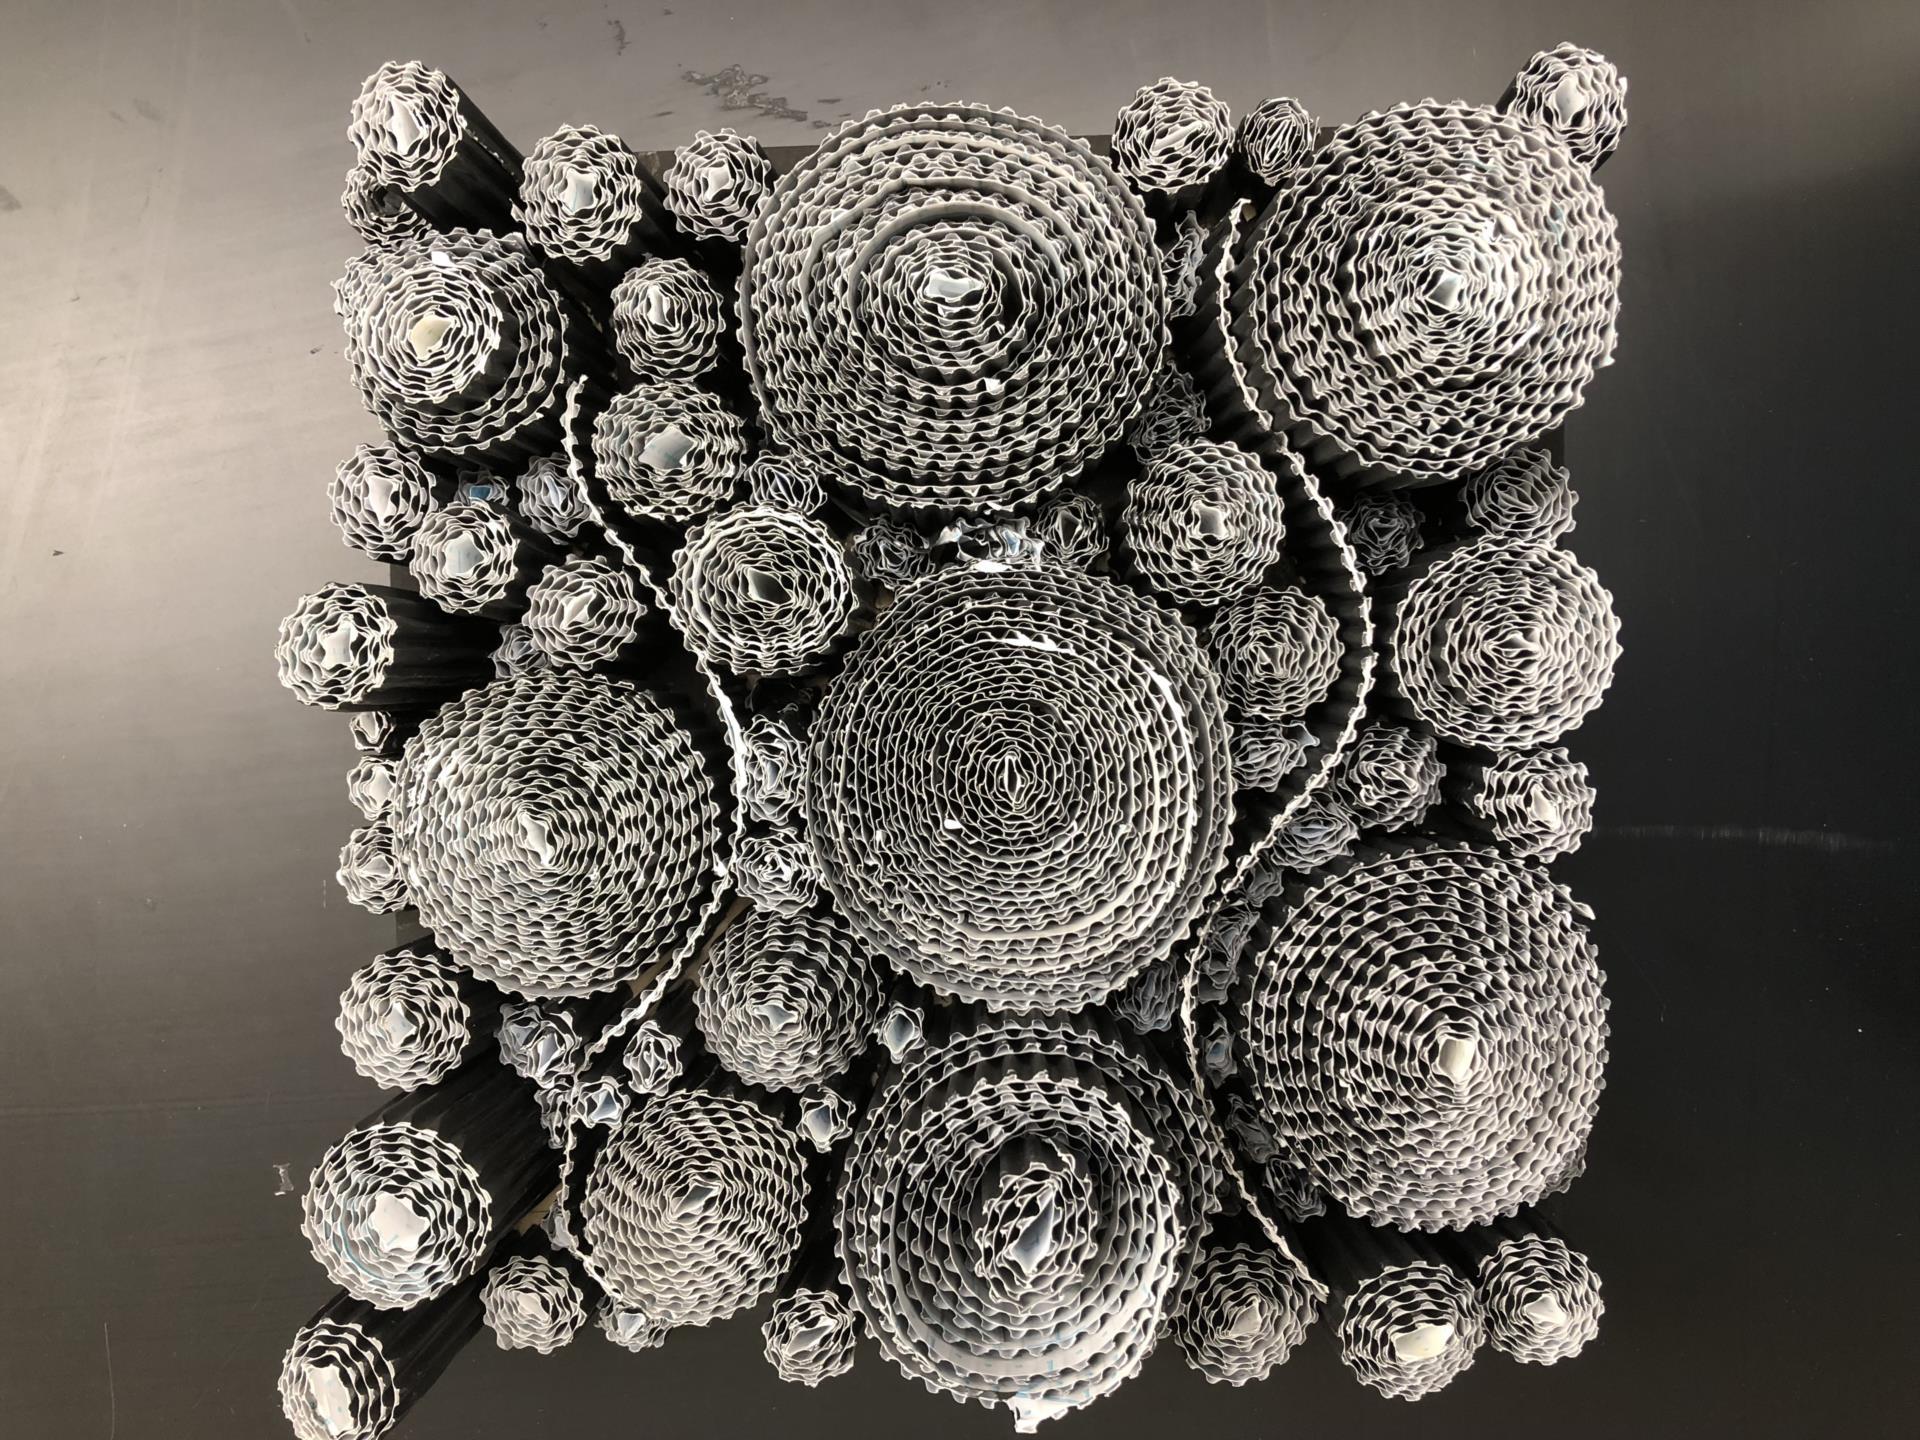 Silver and gray circular design patterns